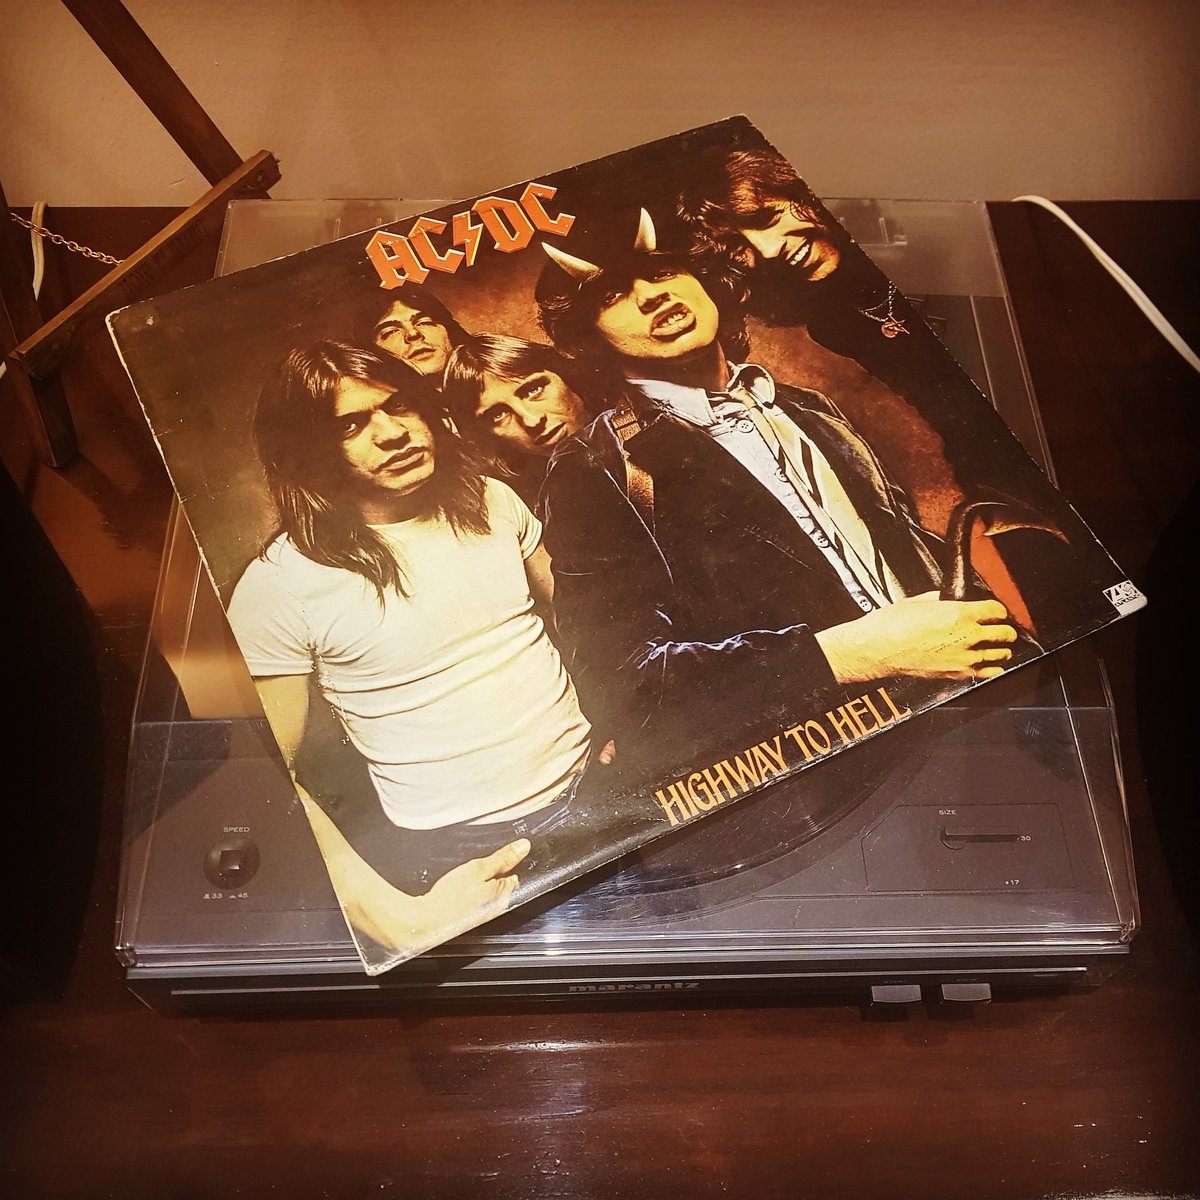 A wild #album, for a wild week! - #ACDC #HighwayToHell #Rock #HardRock #AussieRock #Vinyl #LP #Record #RecordCollection #RecordAddict #VinylCollector #VinylAddict #VinylCollection #VinylCollectionPost #LPCollectionpic.twitter.com/t1wyNBamkP